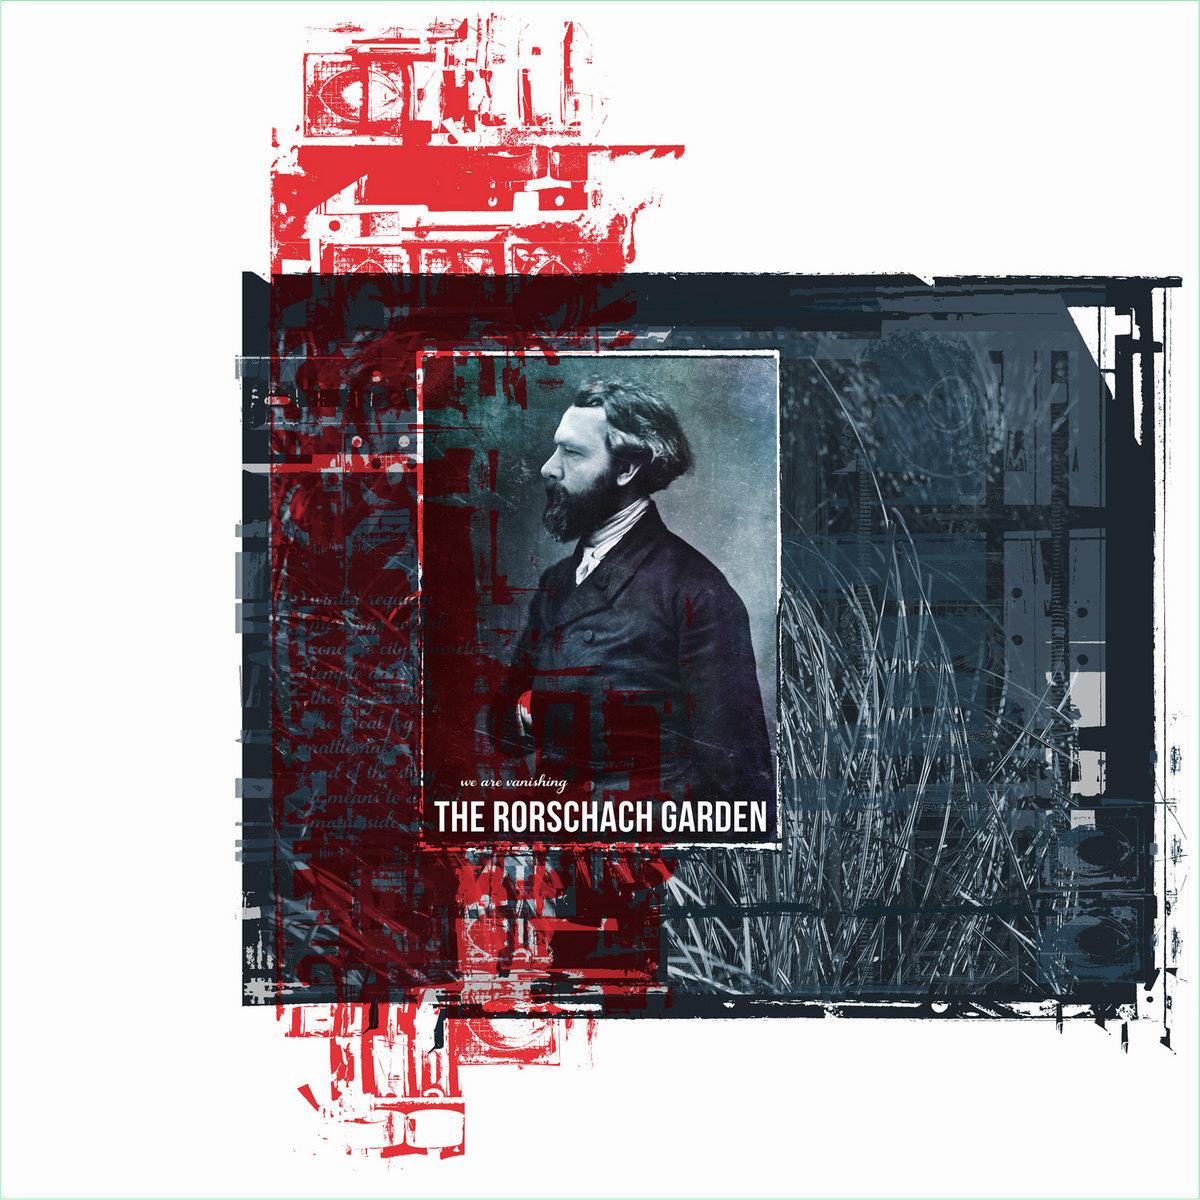 The rorschach garden - We are vanishing